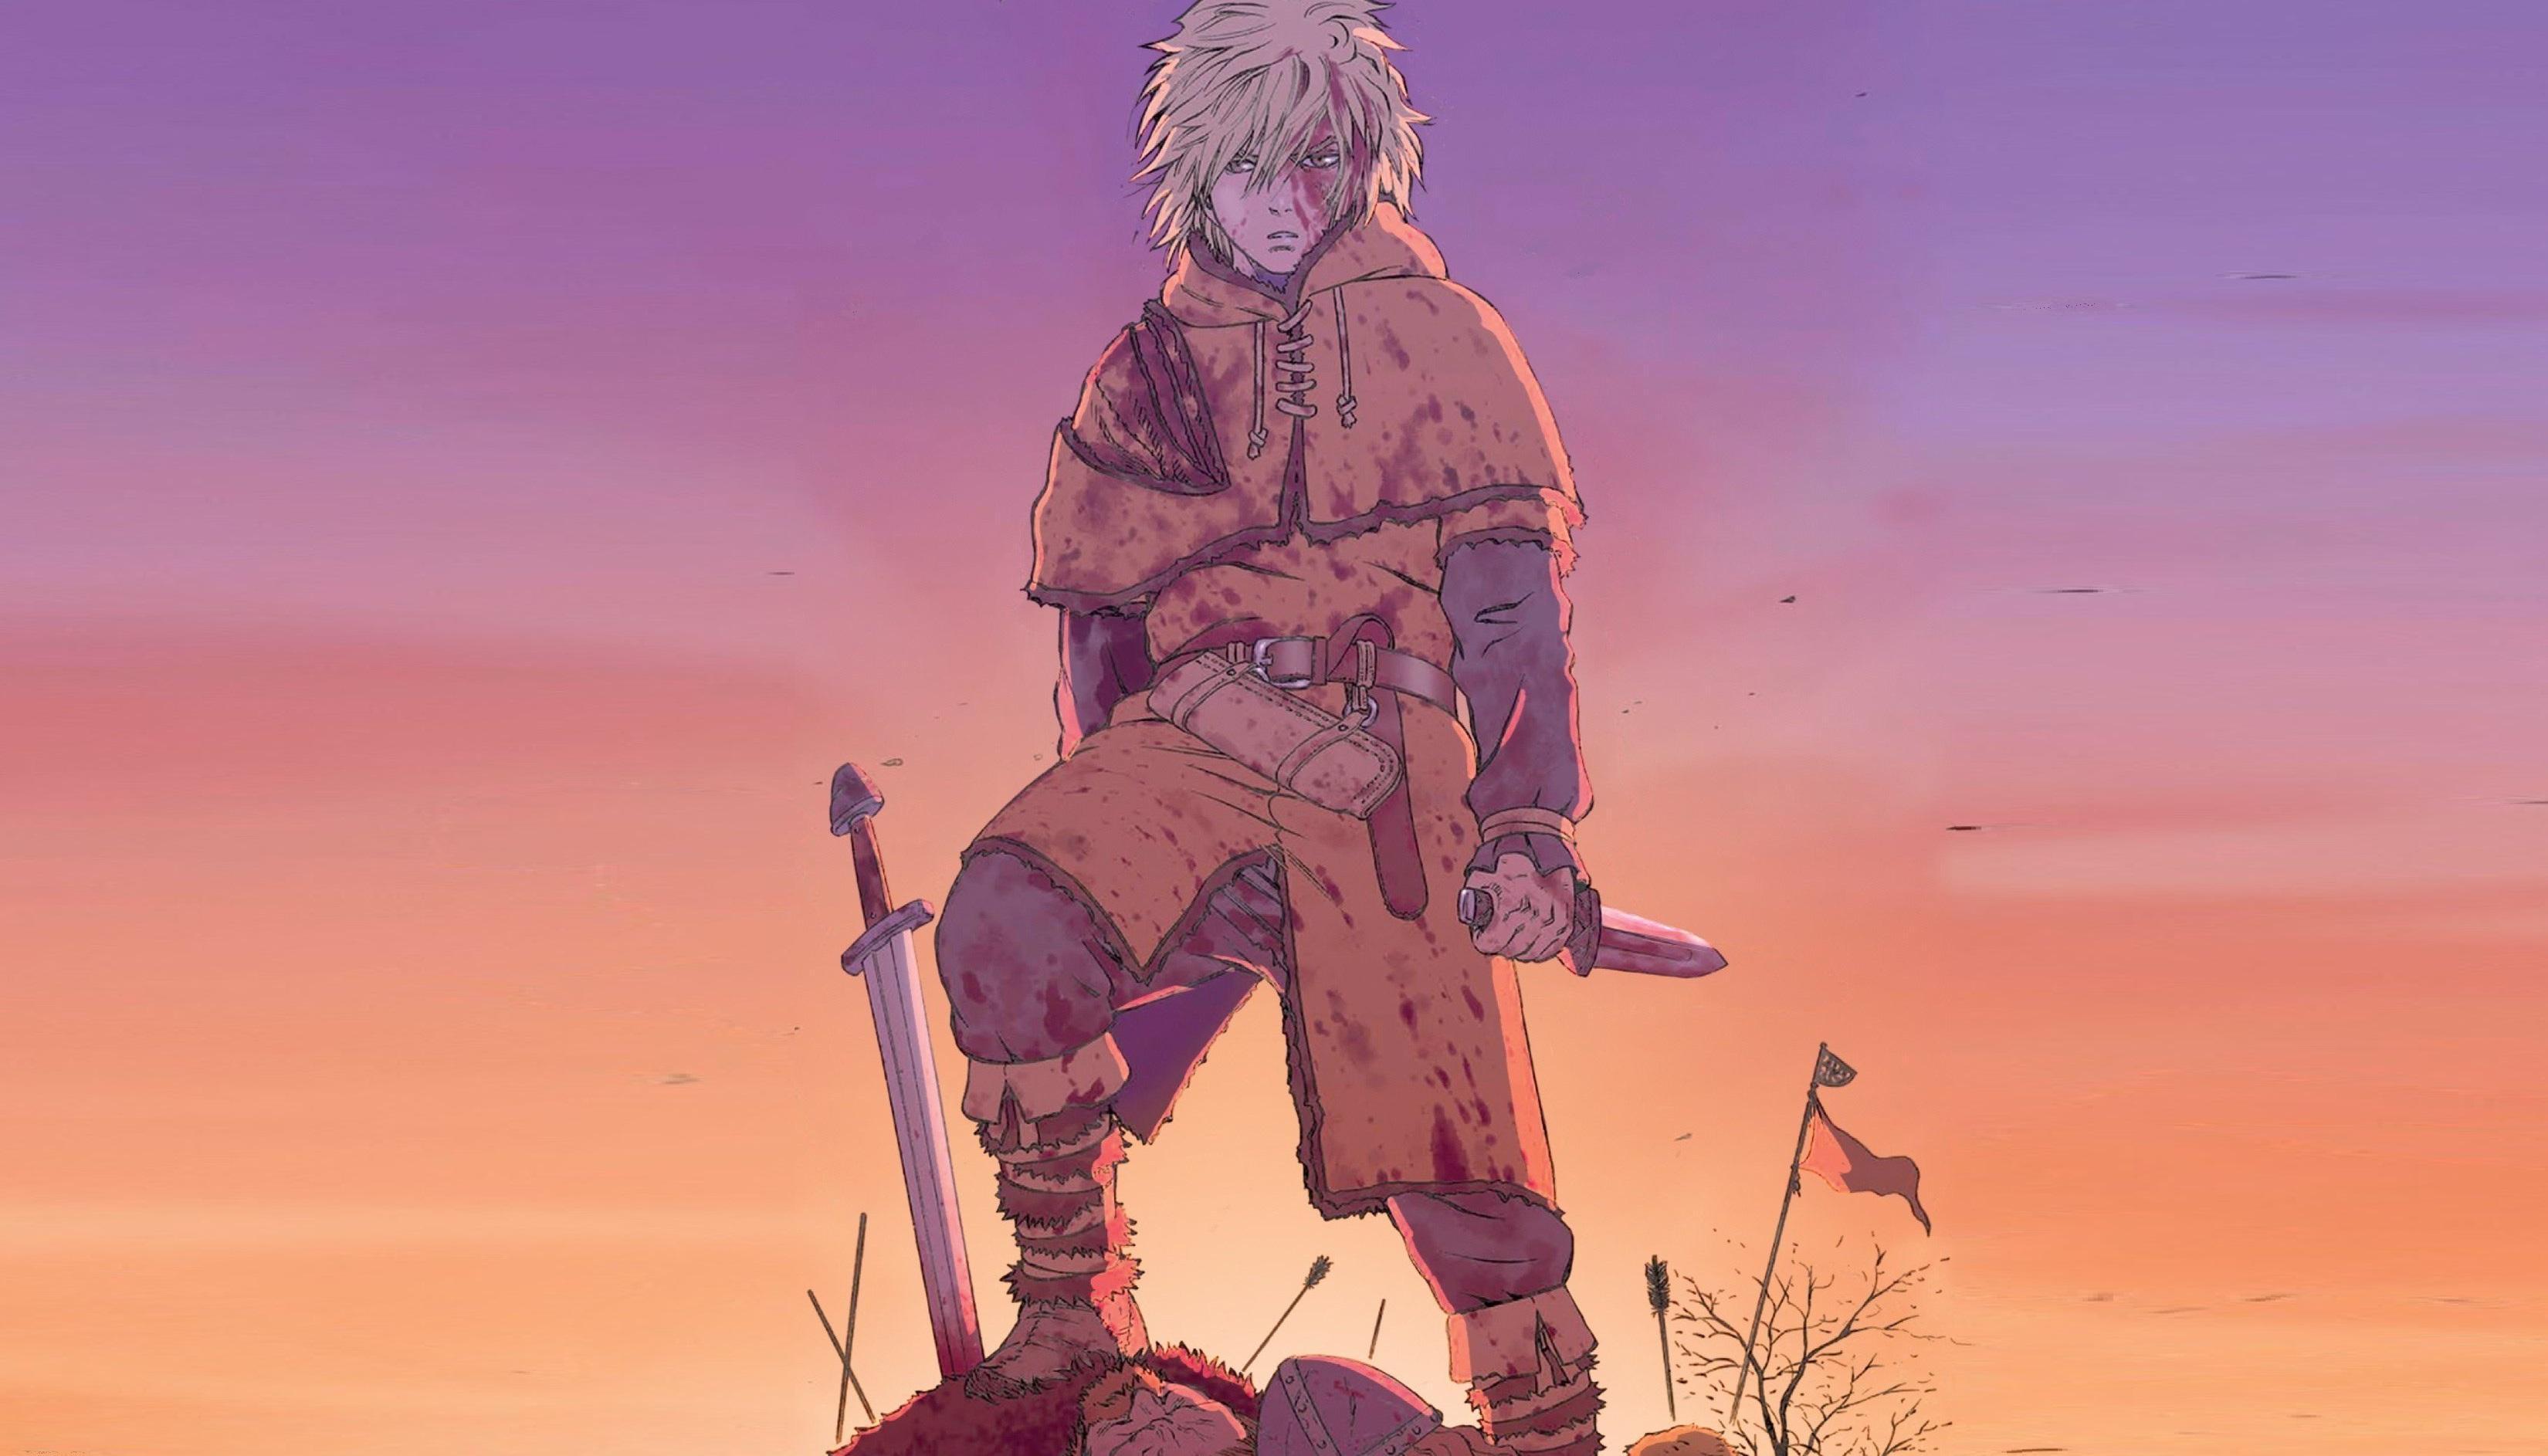 Vinland Saga Wallpapers - Top Free Vinland Saga Backgrounds ...